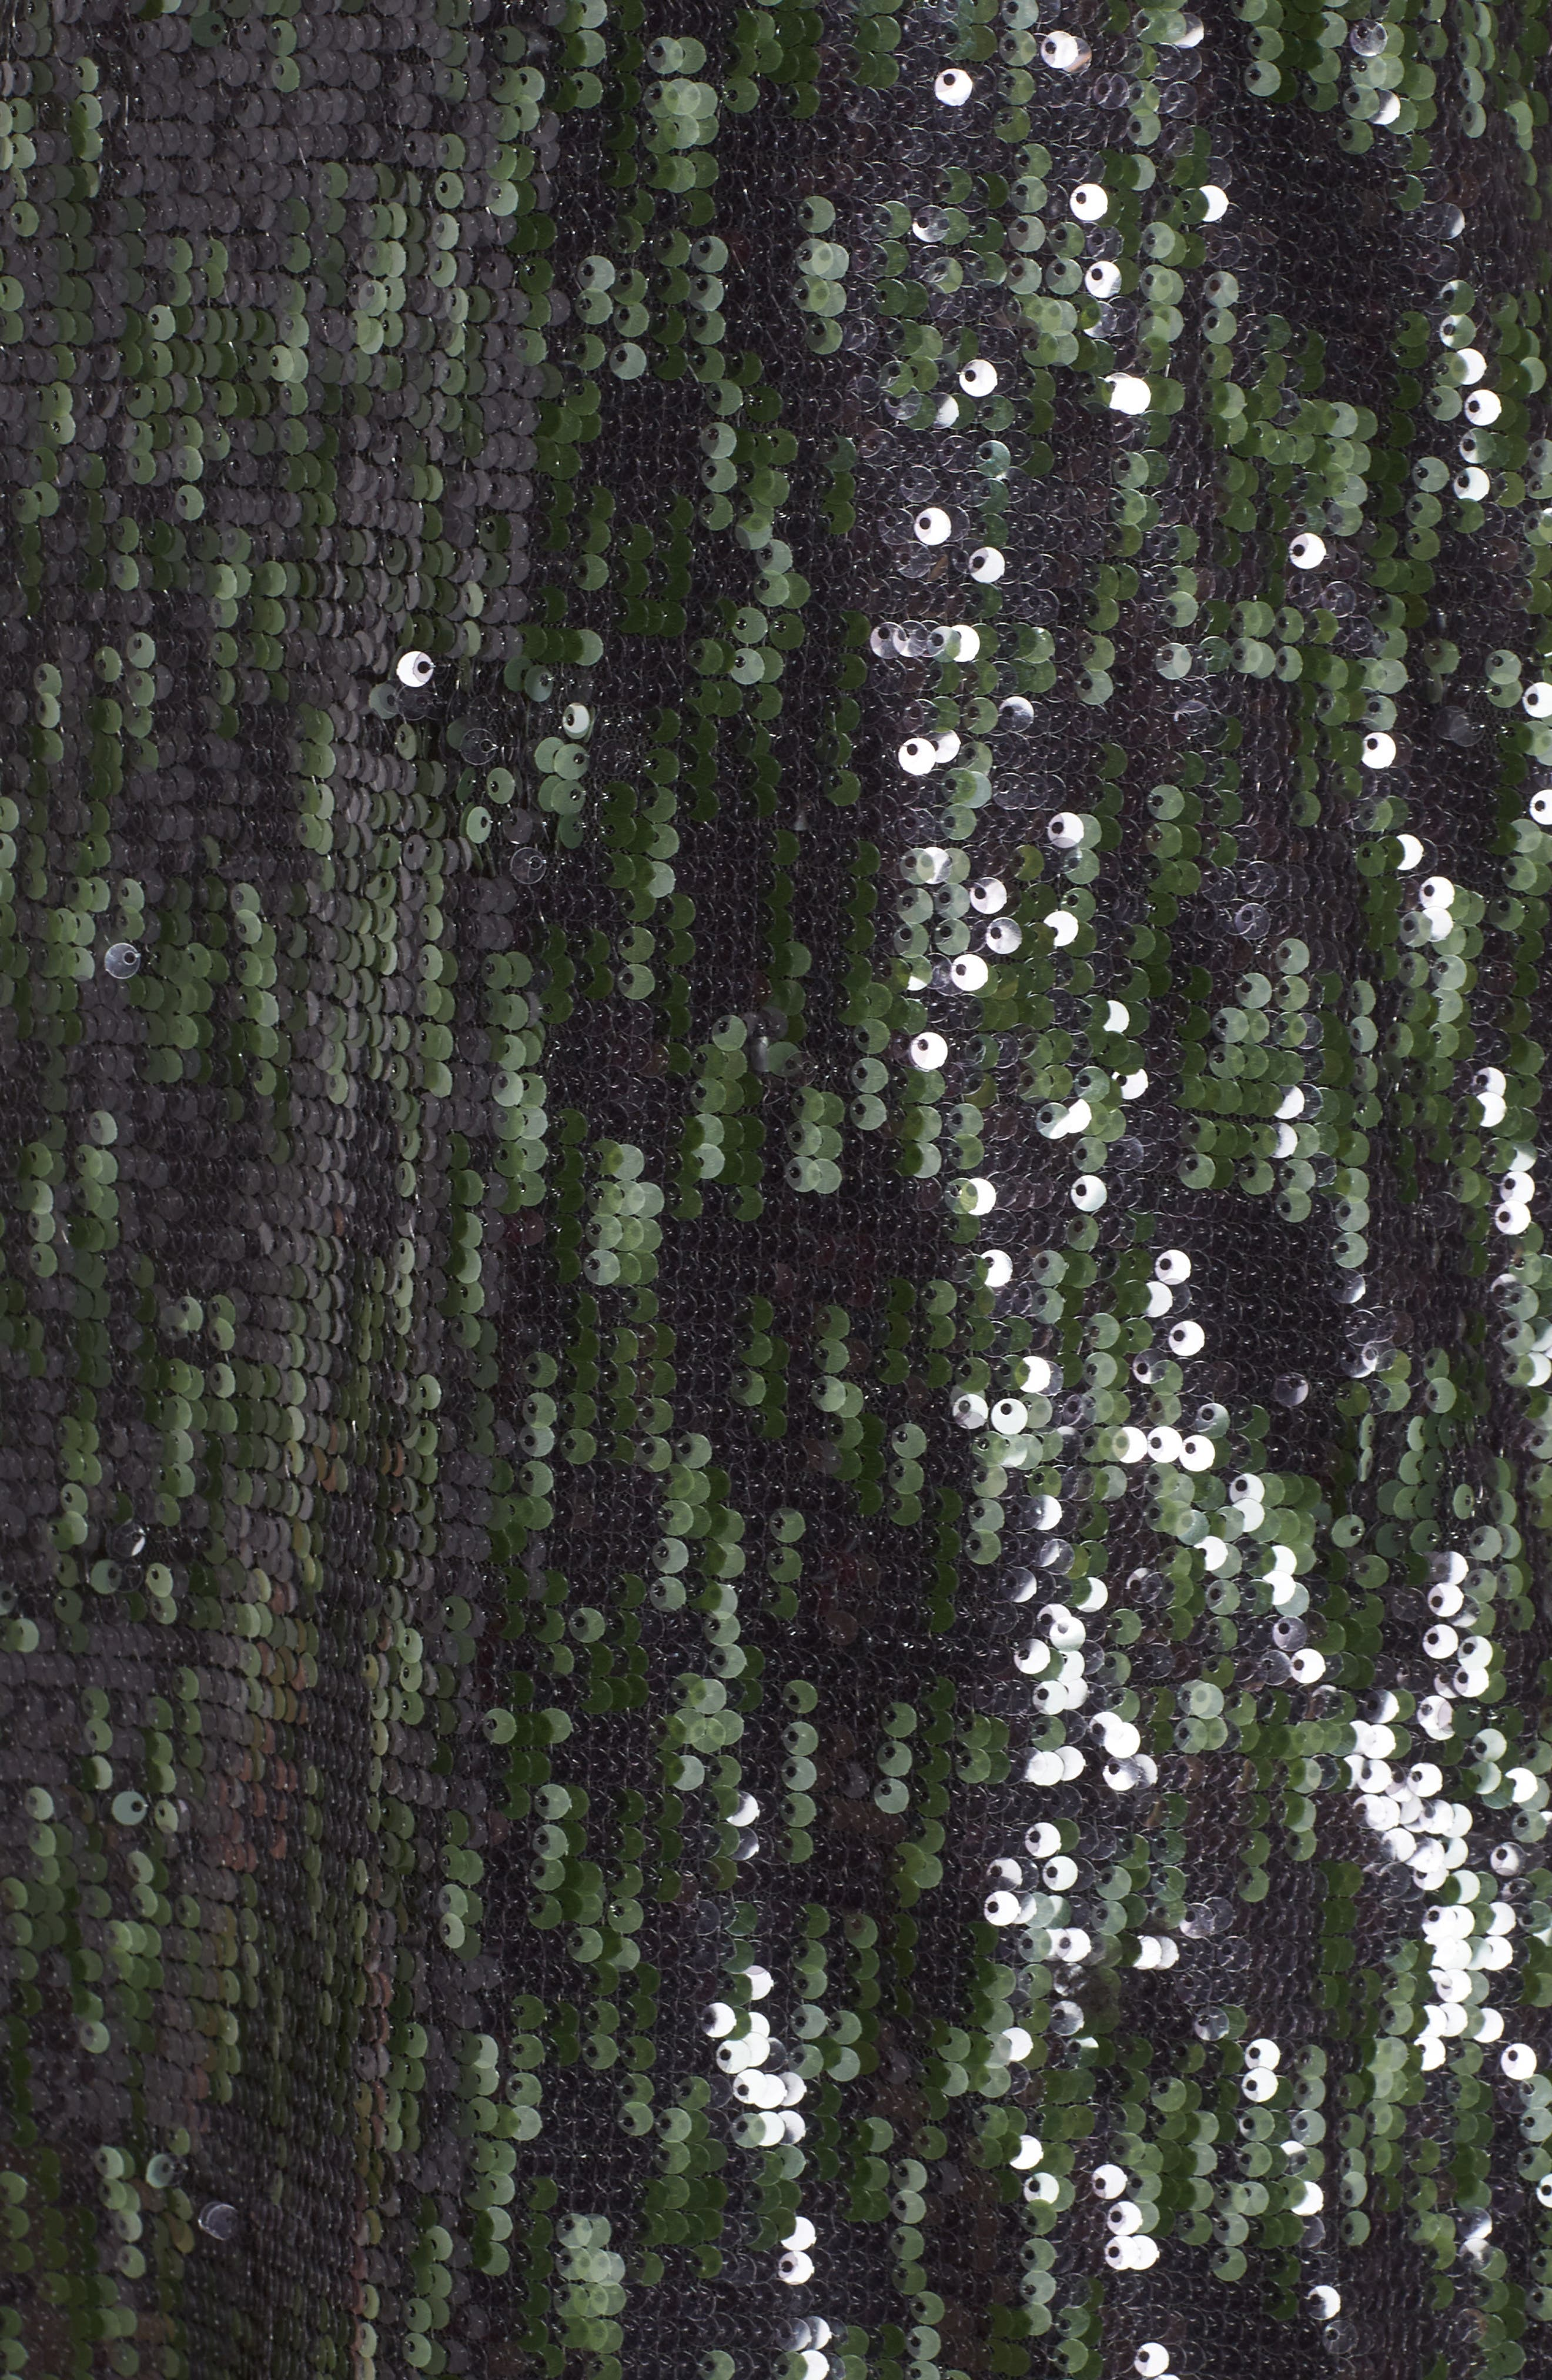 Camo Sequin Dress,                             Alternate thumbnail 5, color,                             BLACK/ GREEN